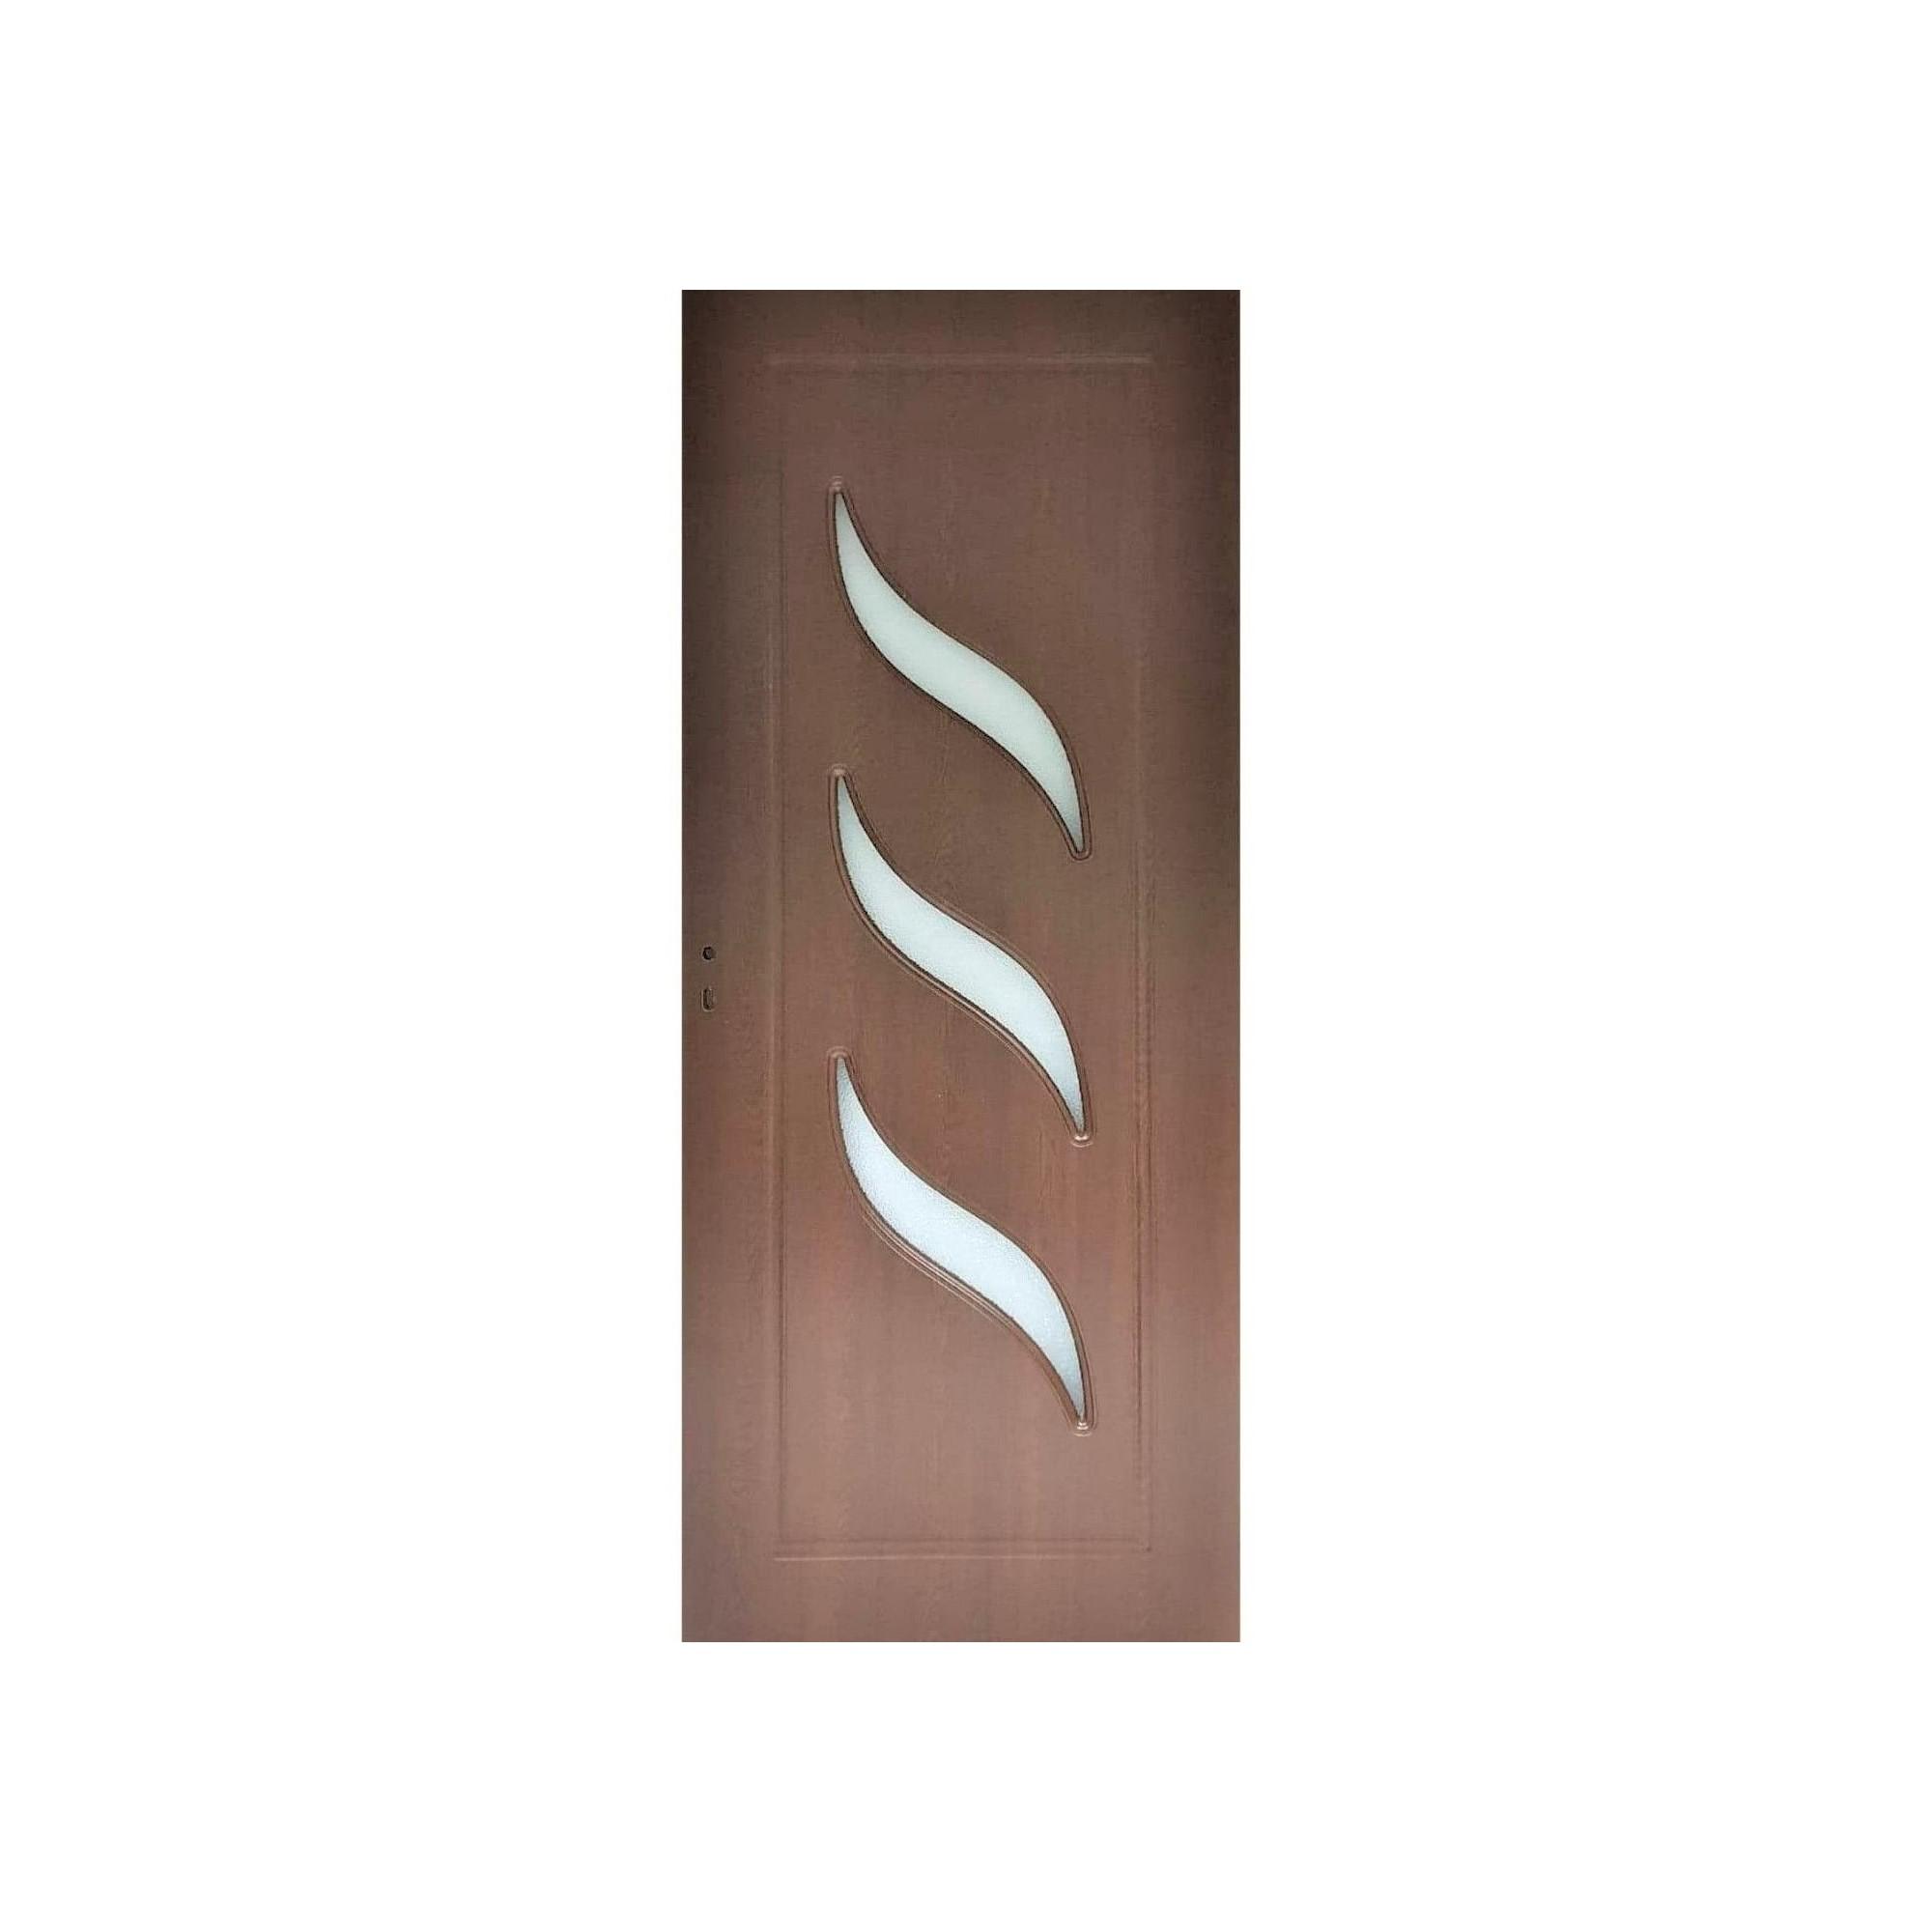 Usa interior cu geam Pamate M02, stejar auriu, 203 x 80 x 3,5 cm + toc reglabil, reversibila mathaus 2021